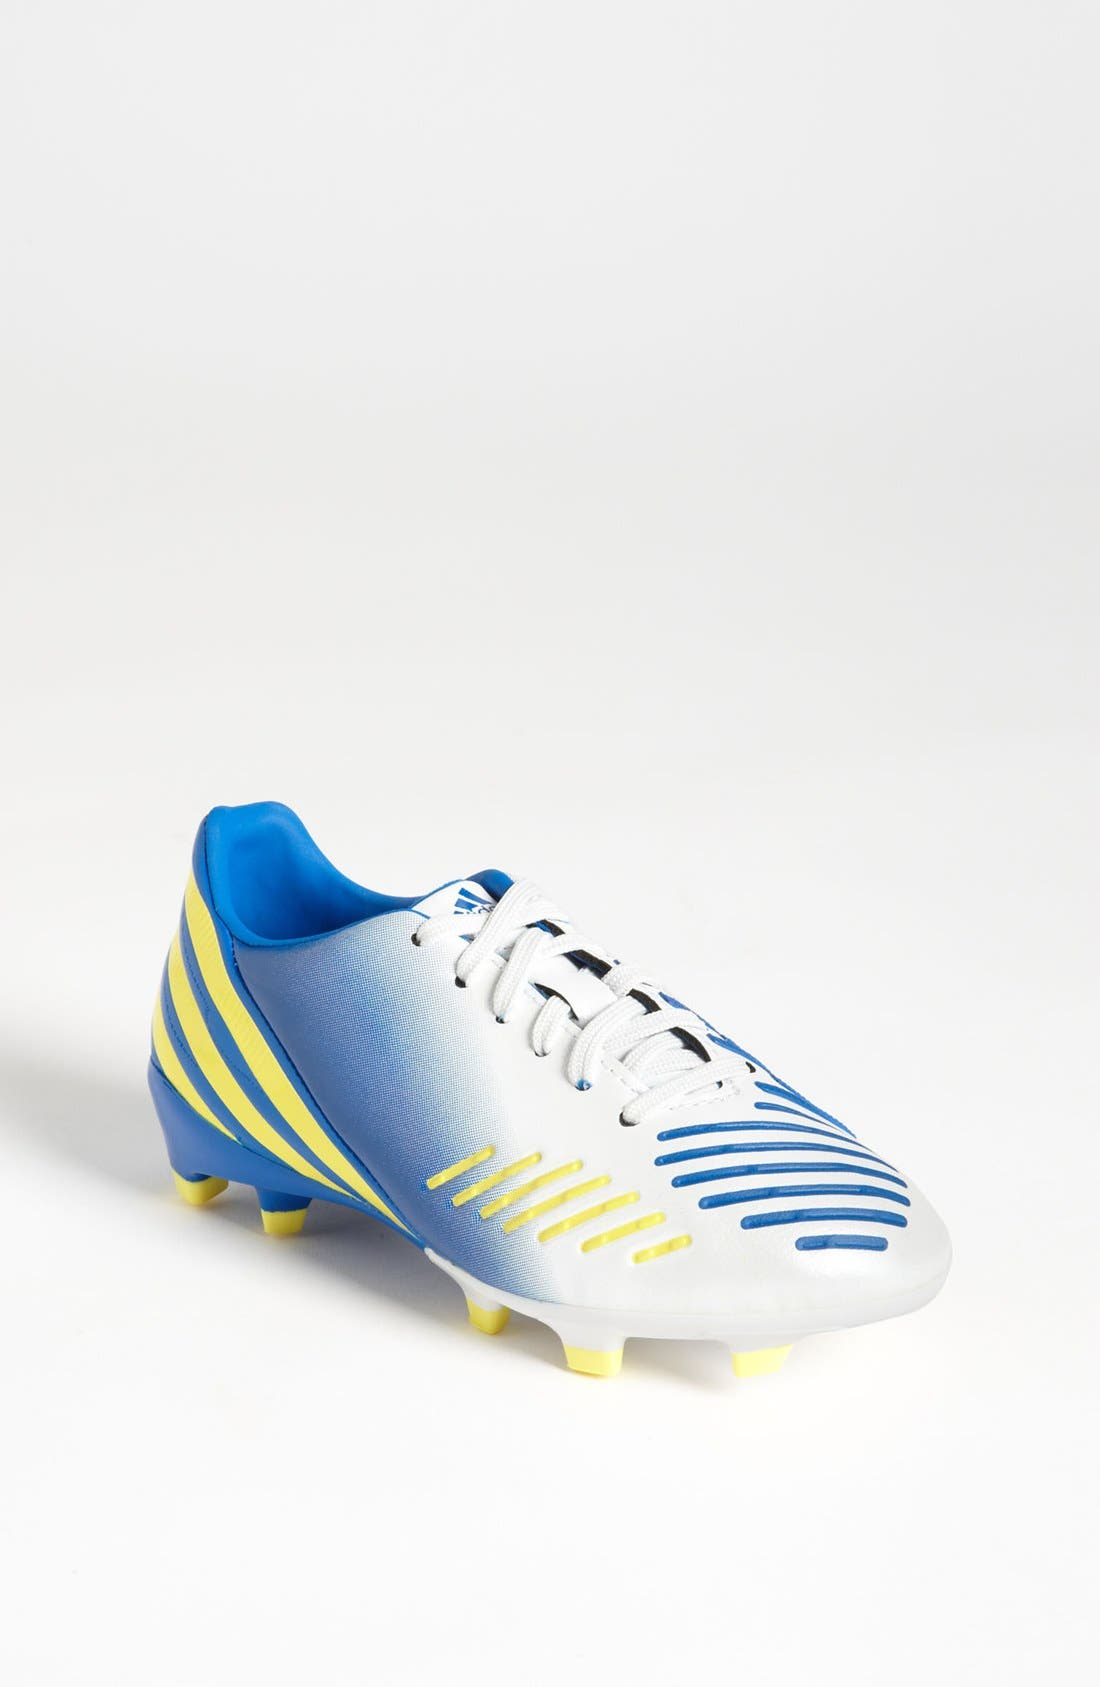 Main Image - adidas 'Predator Absolado LZ TRX FG' Soccer Cleats (Toddler, Little Kid & Big Kid)